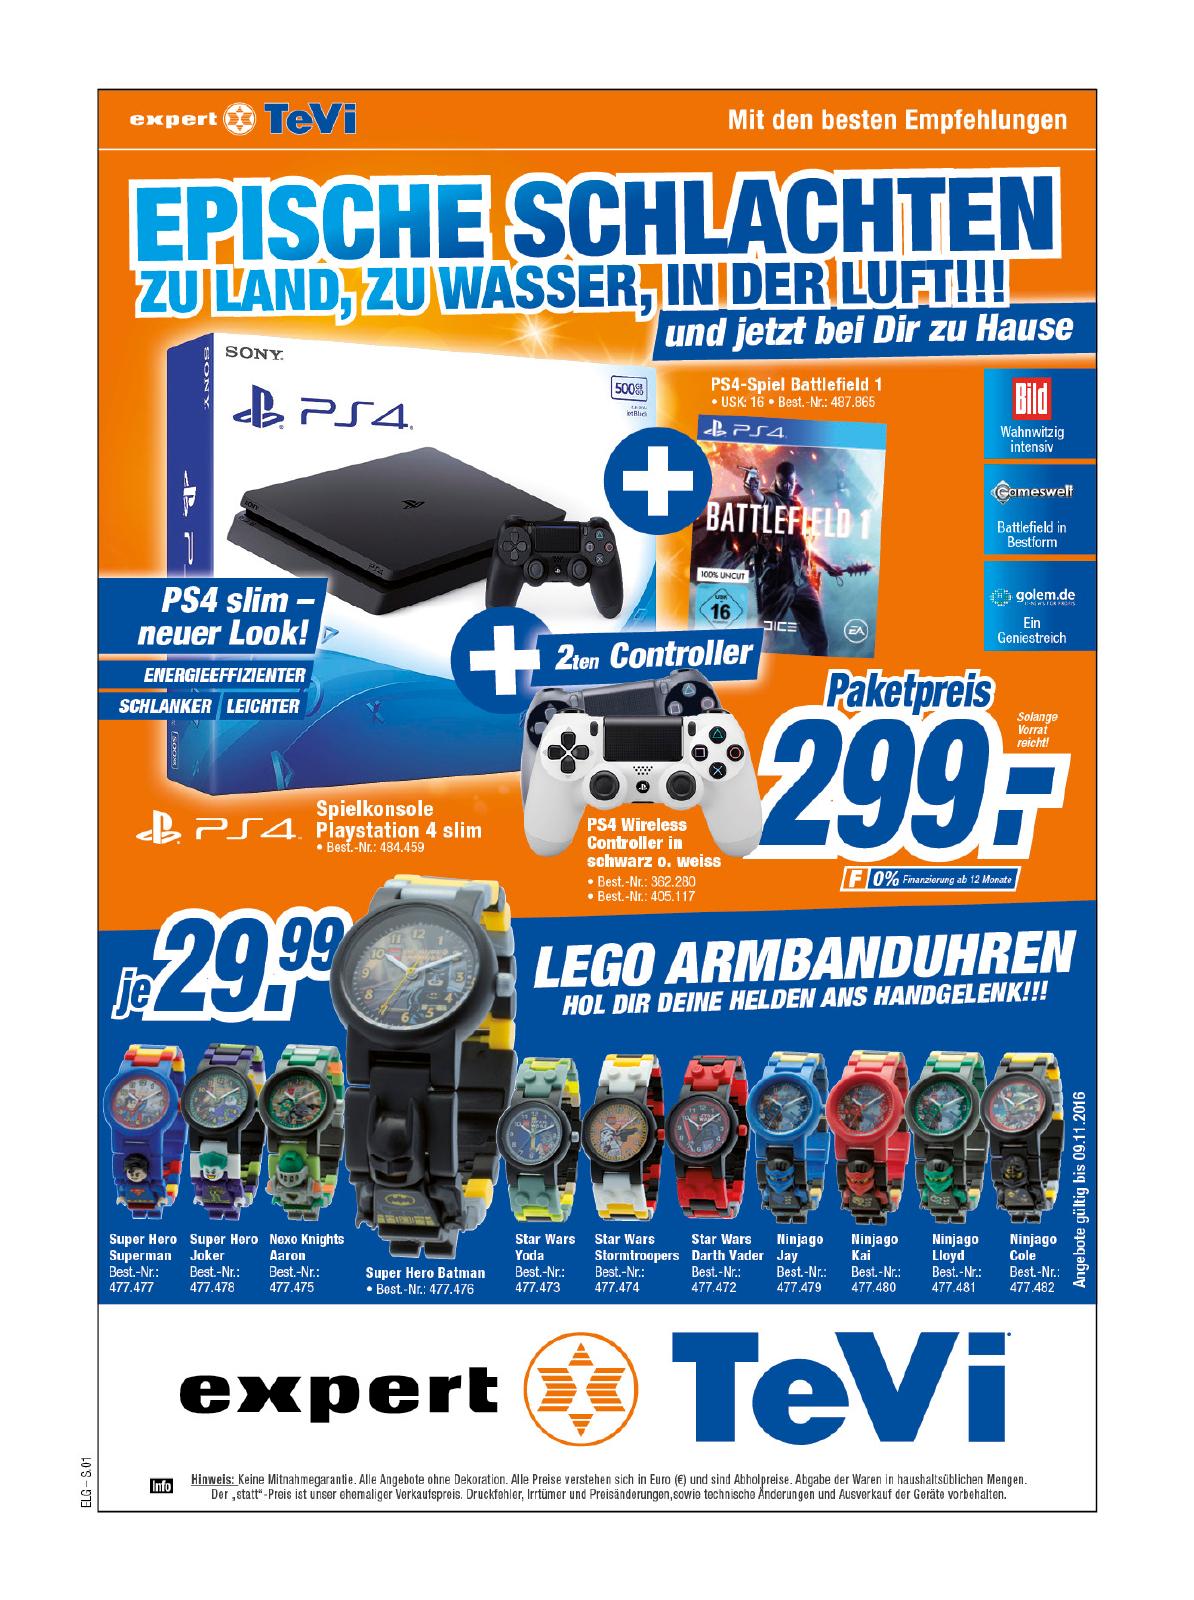 Lokal (Expert Tevi Nürnberg )   PS4 Slim 500GB mit Battlefield 1 und 2. Controller